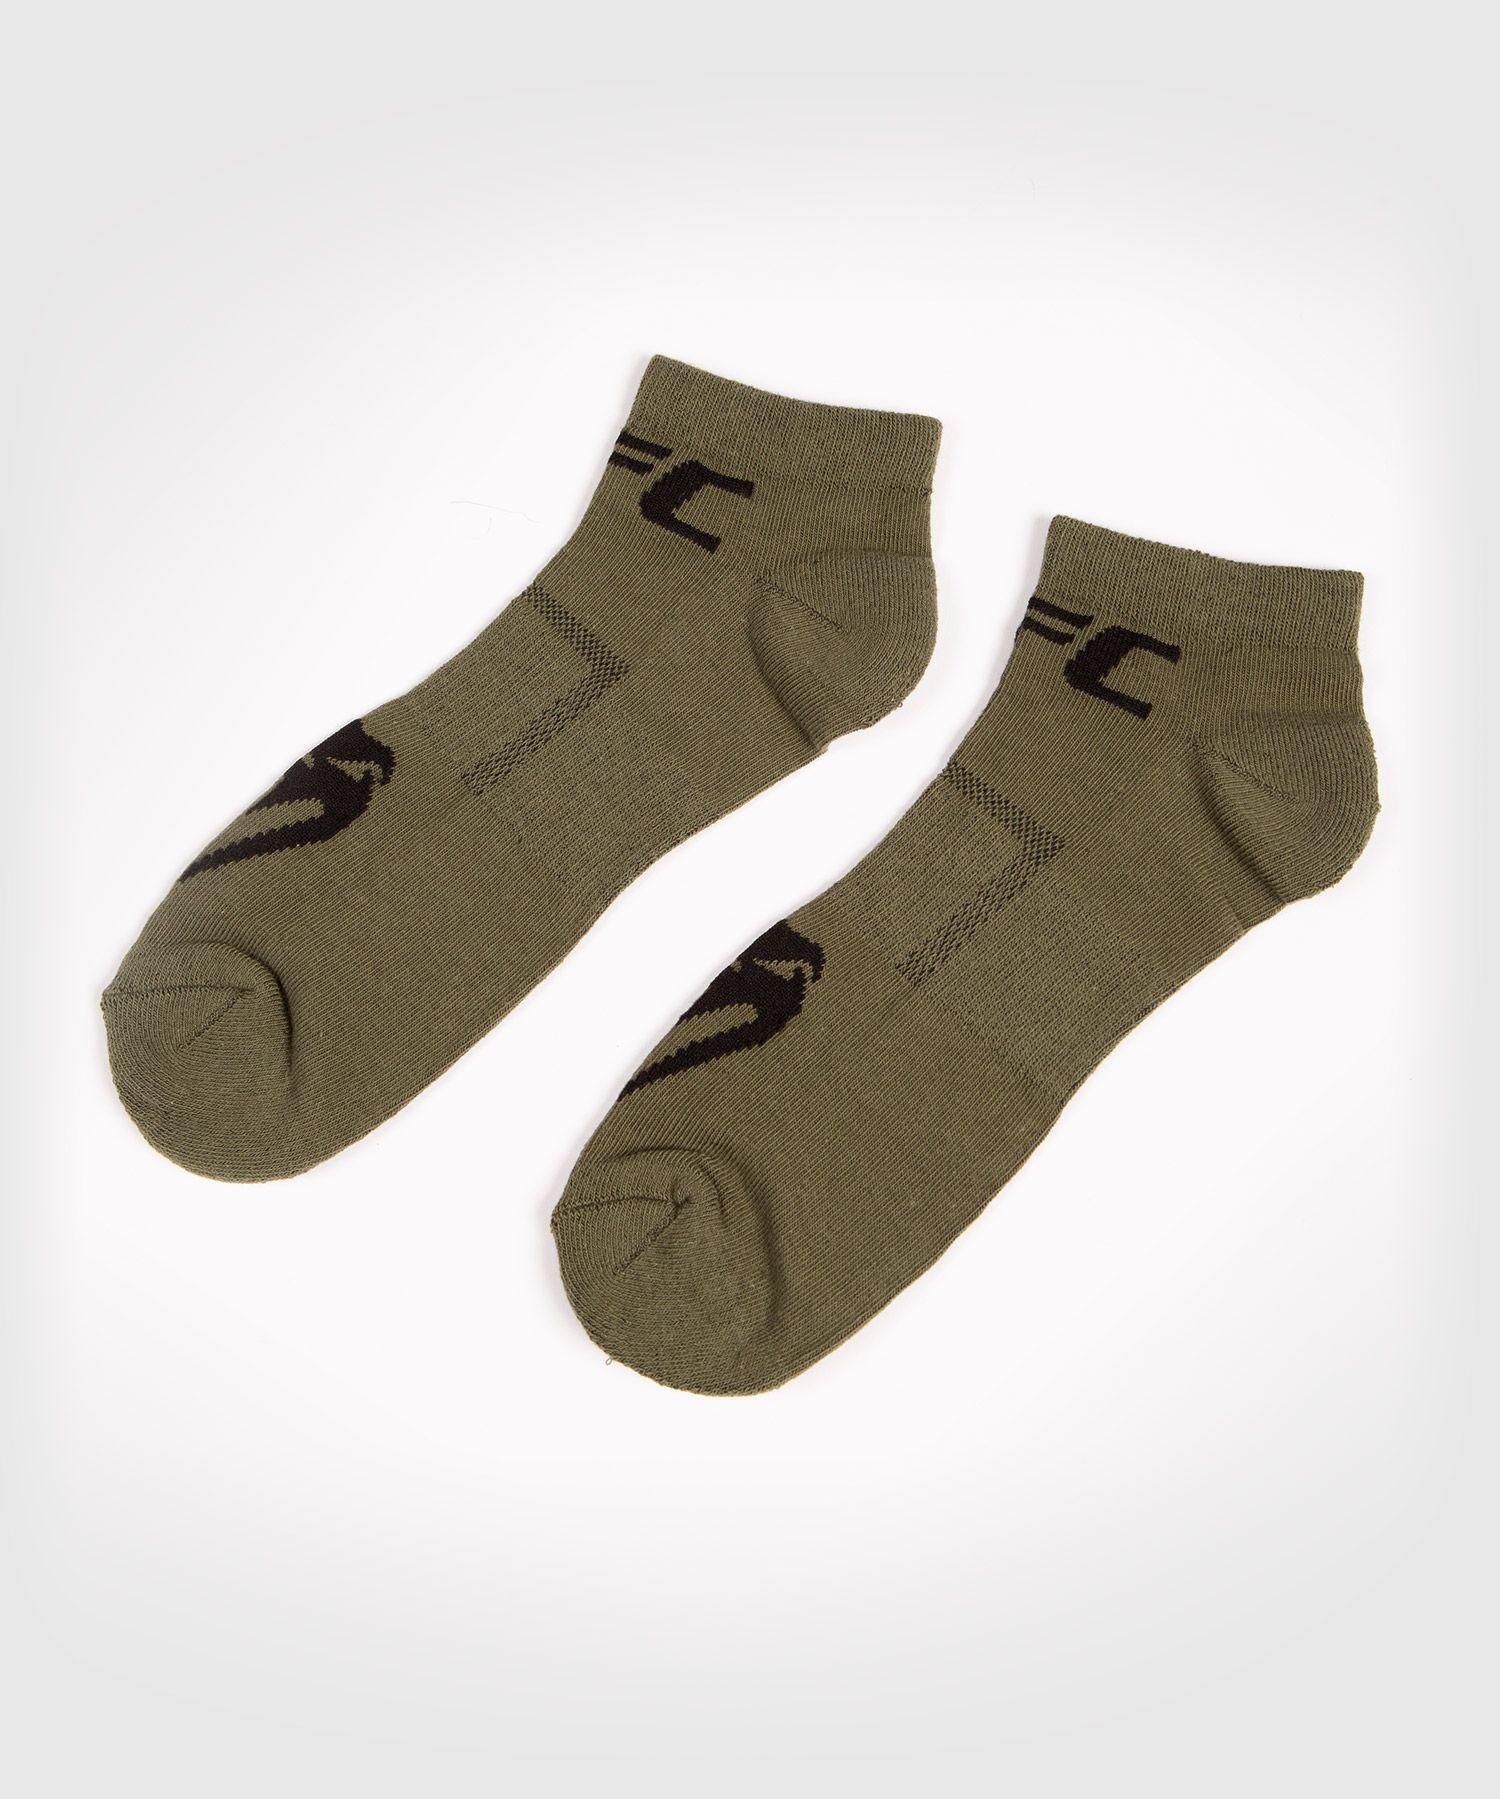 UFC Venum Authentic Fight Week Unisex Performance Socken 2er-Set - Khaki